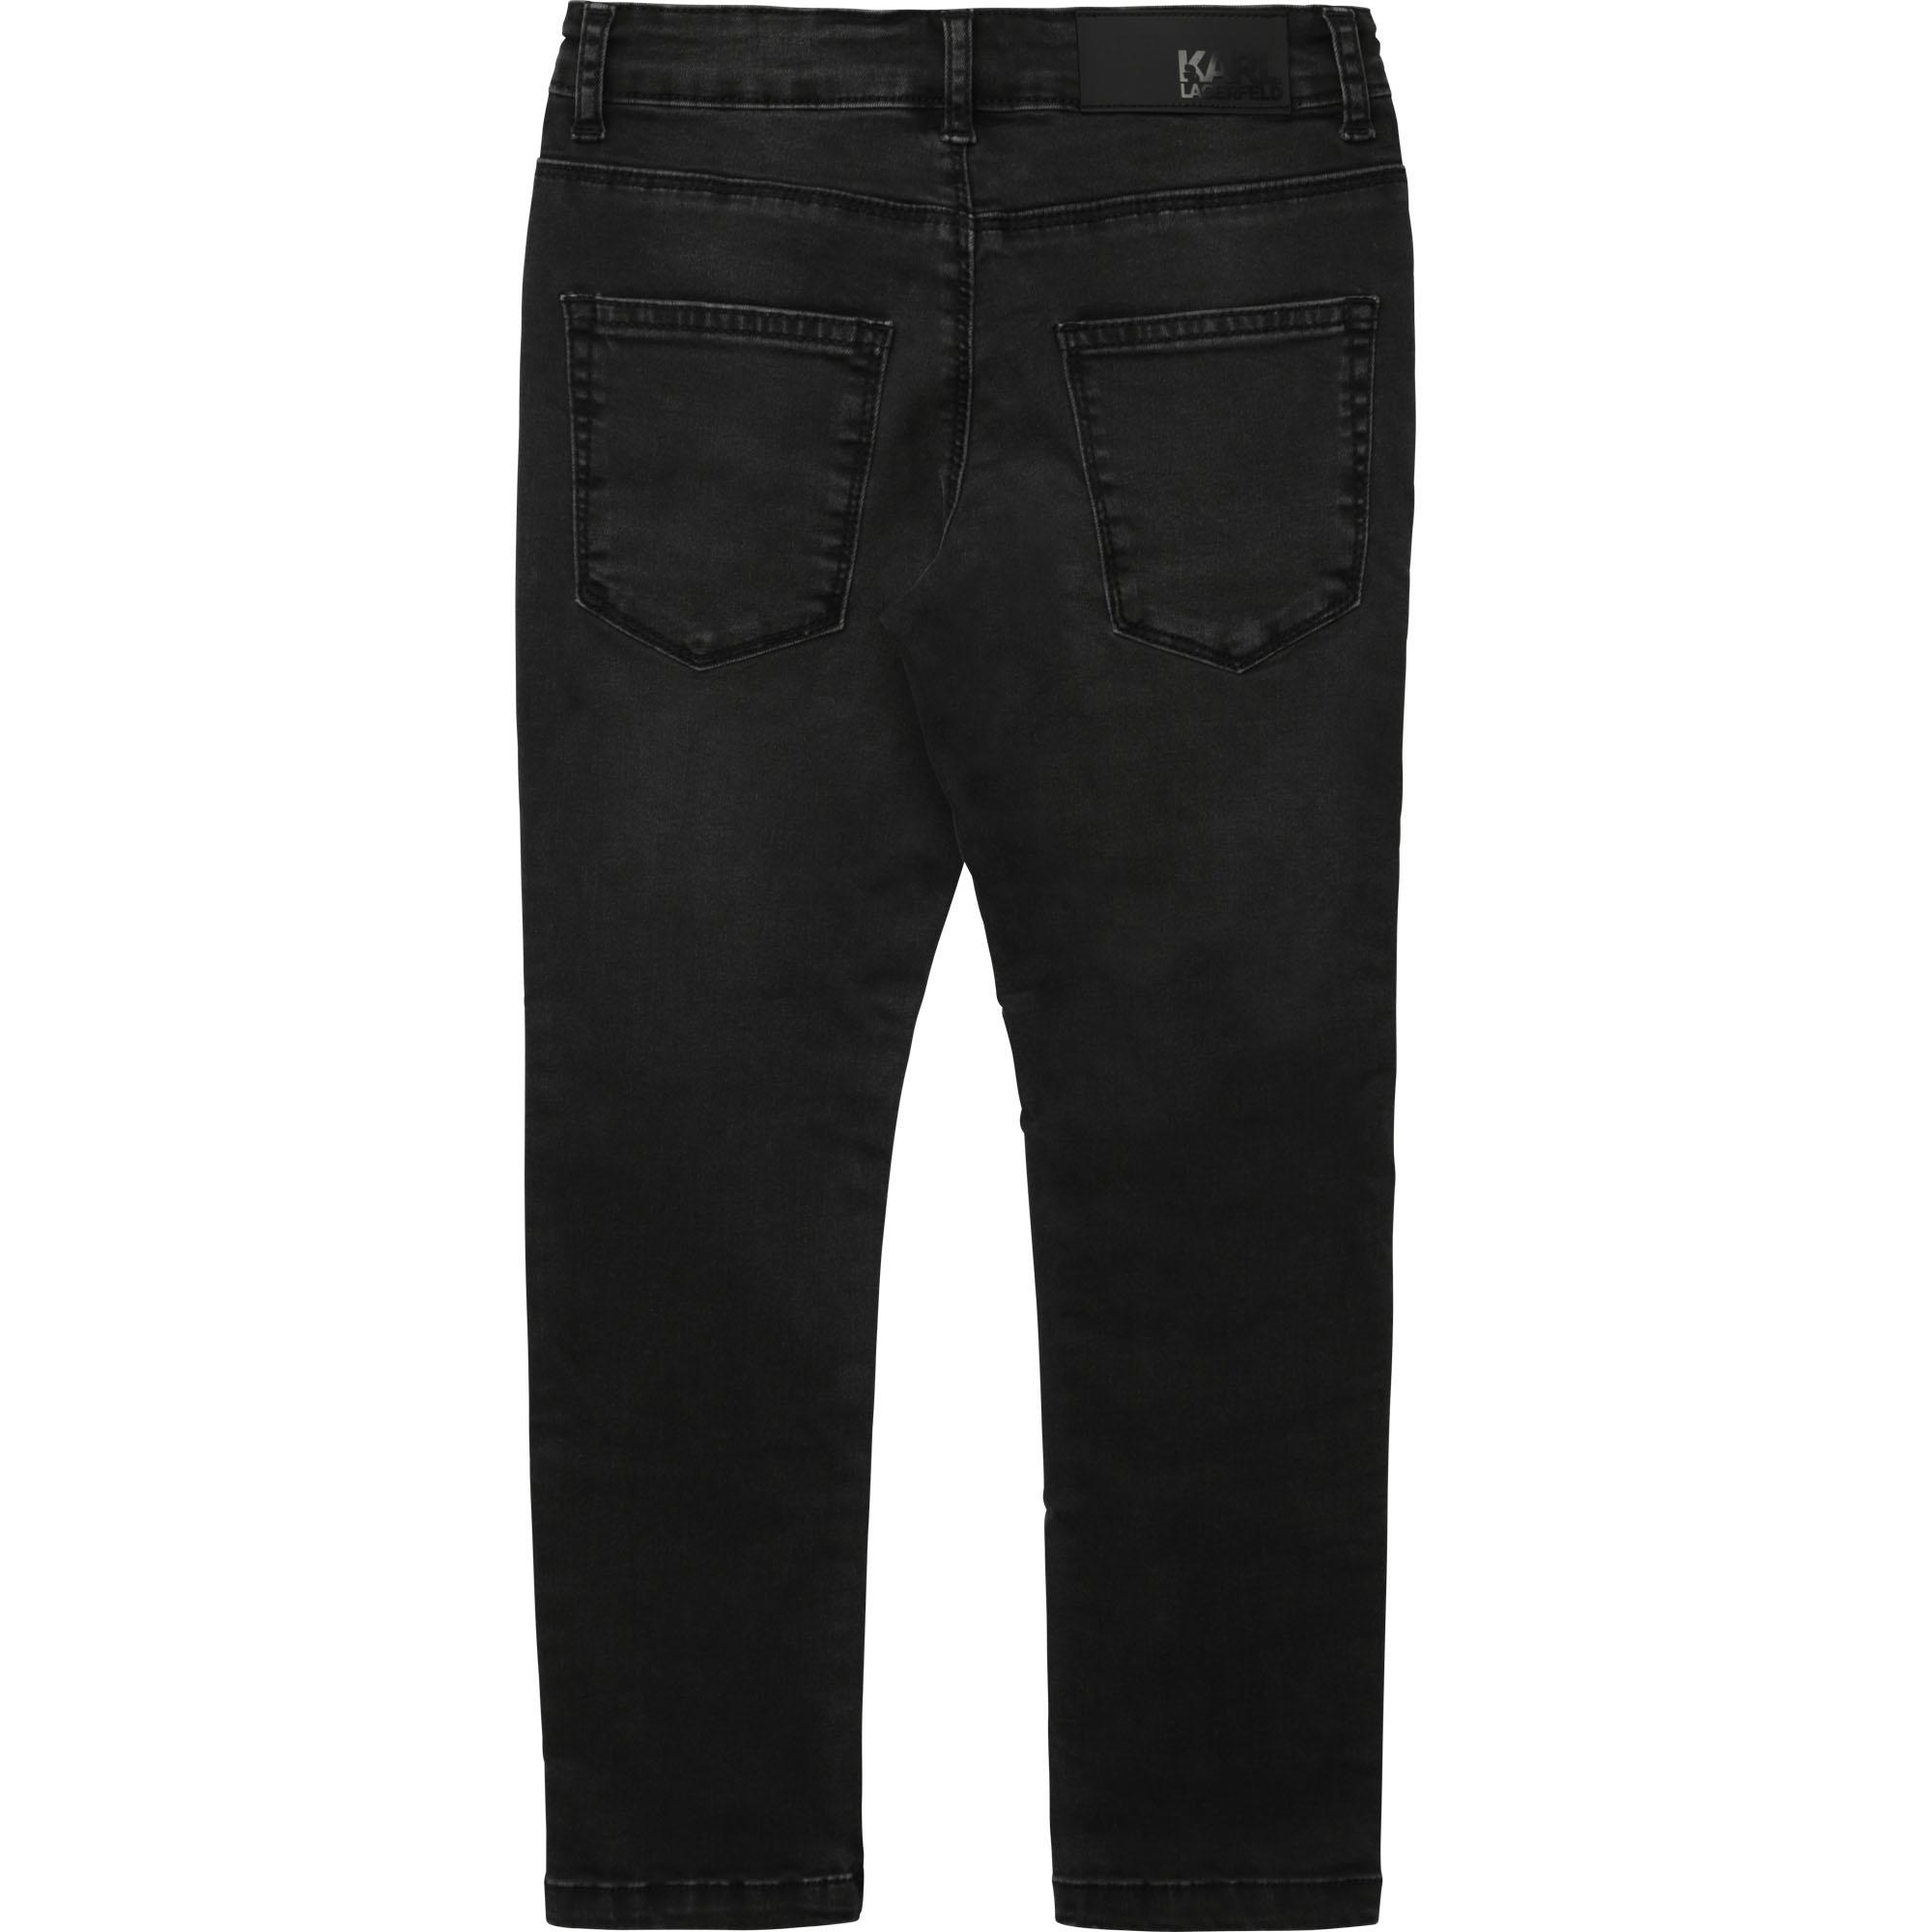 KARL LAGERFELD jeans uni en coton extensible-2